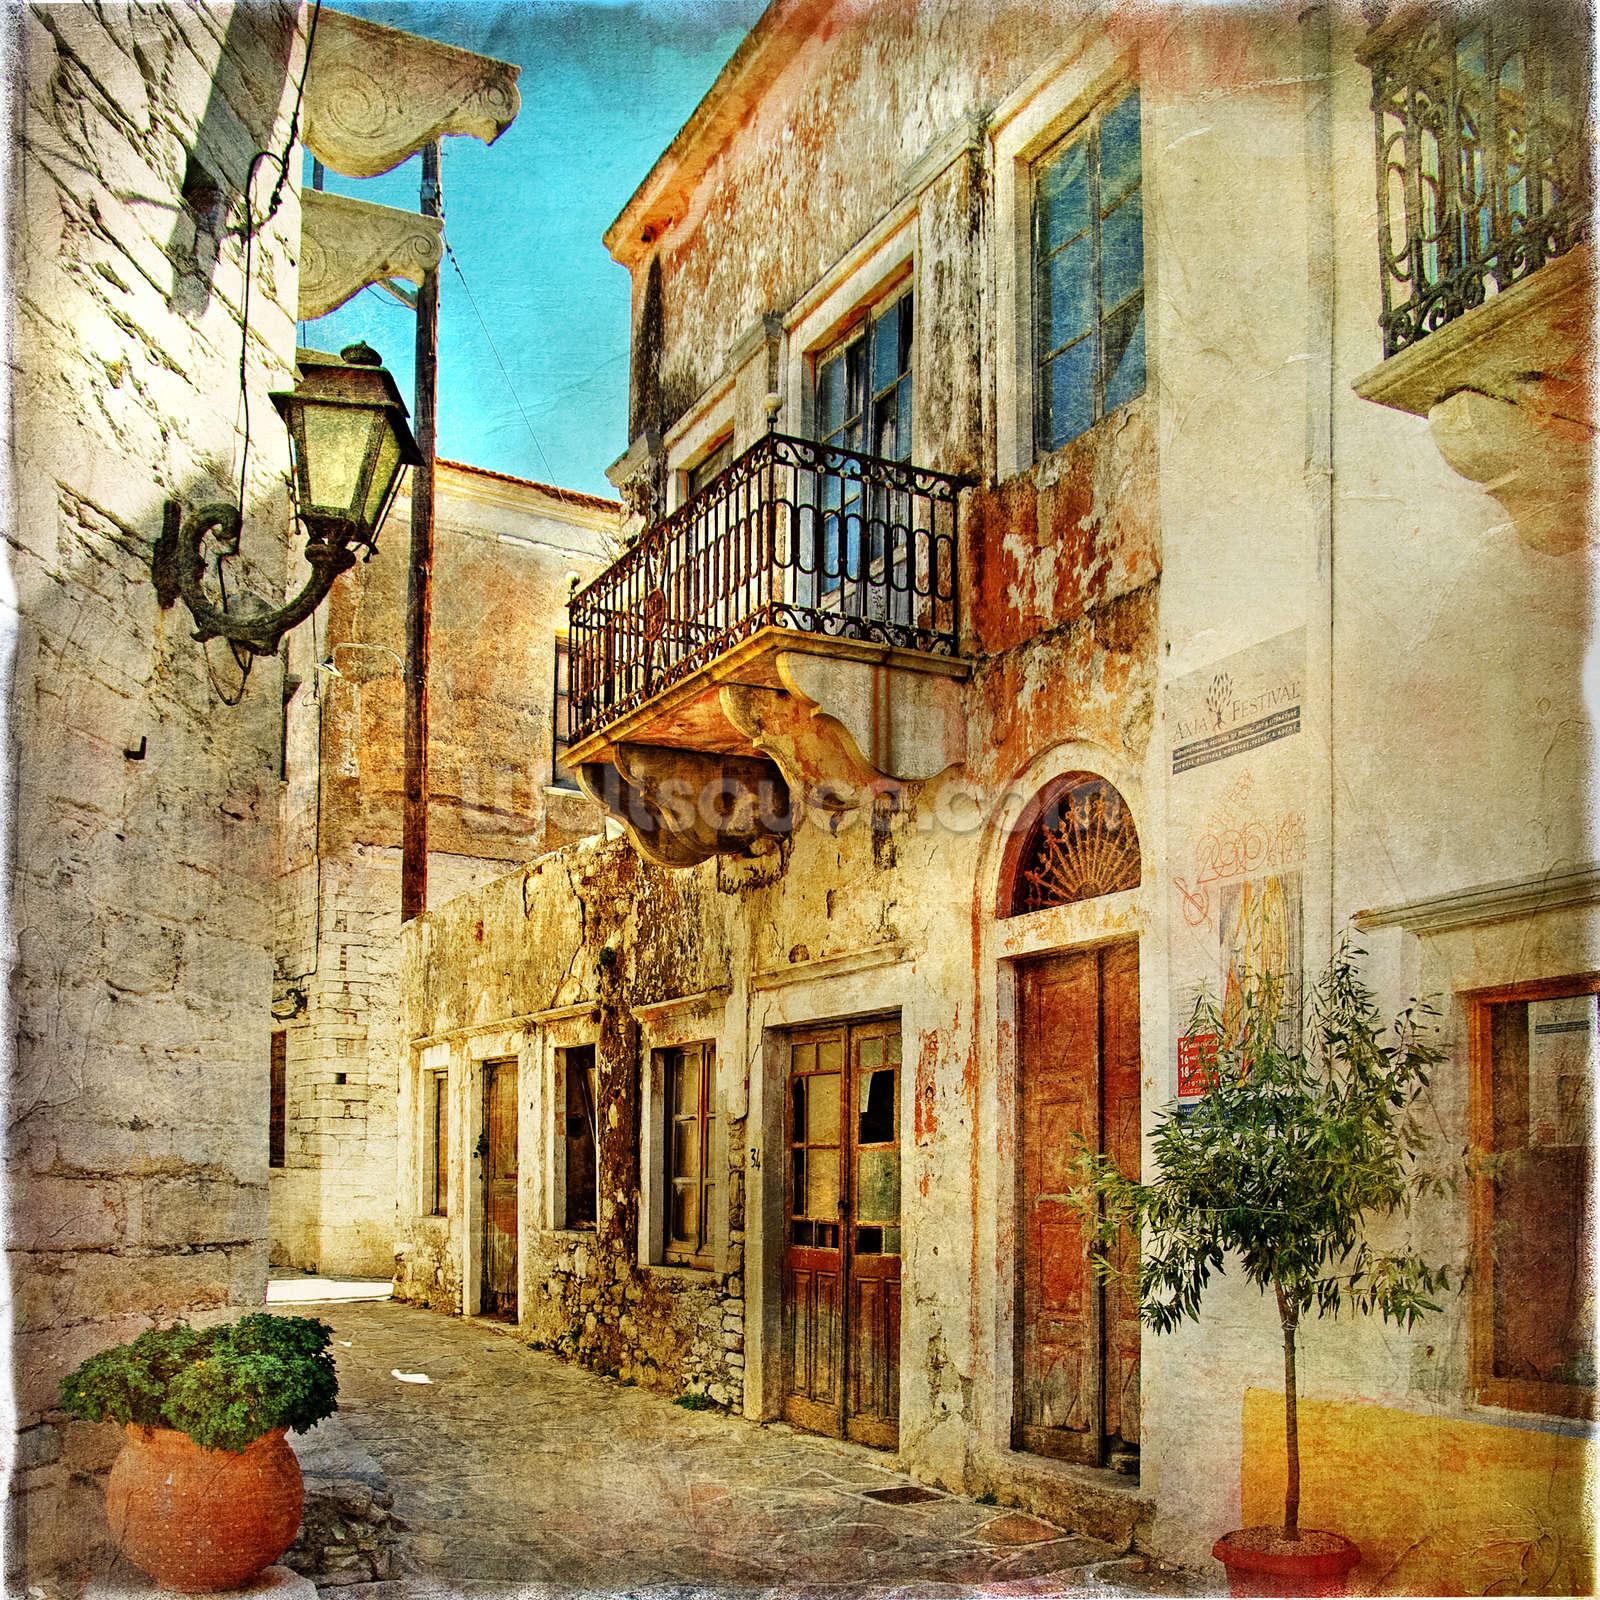 Old Town, Greece Wallpaper Wall Mural | Wallsauce USA